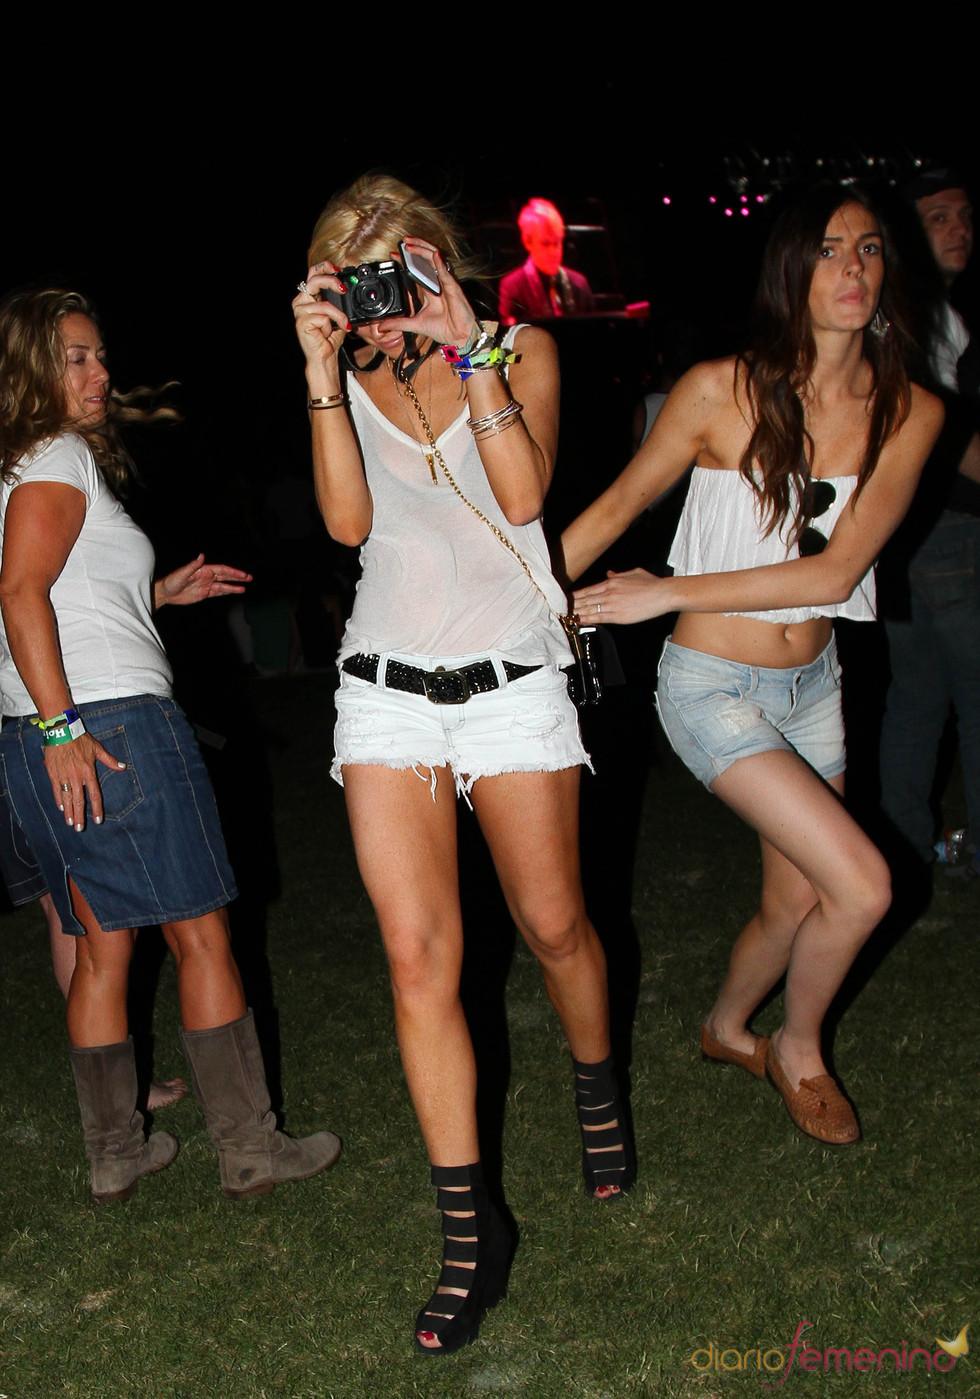 Lindsay Lohan en el Festival de música de Coachella